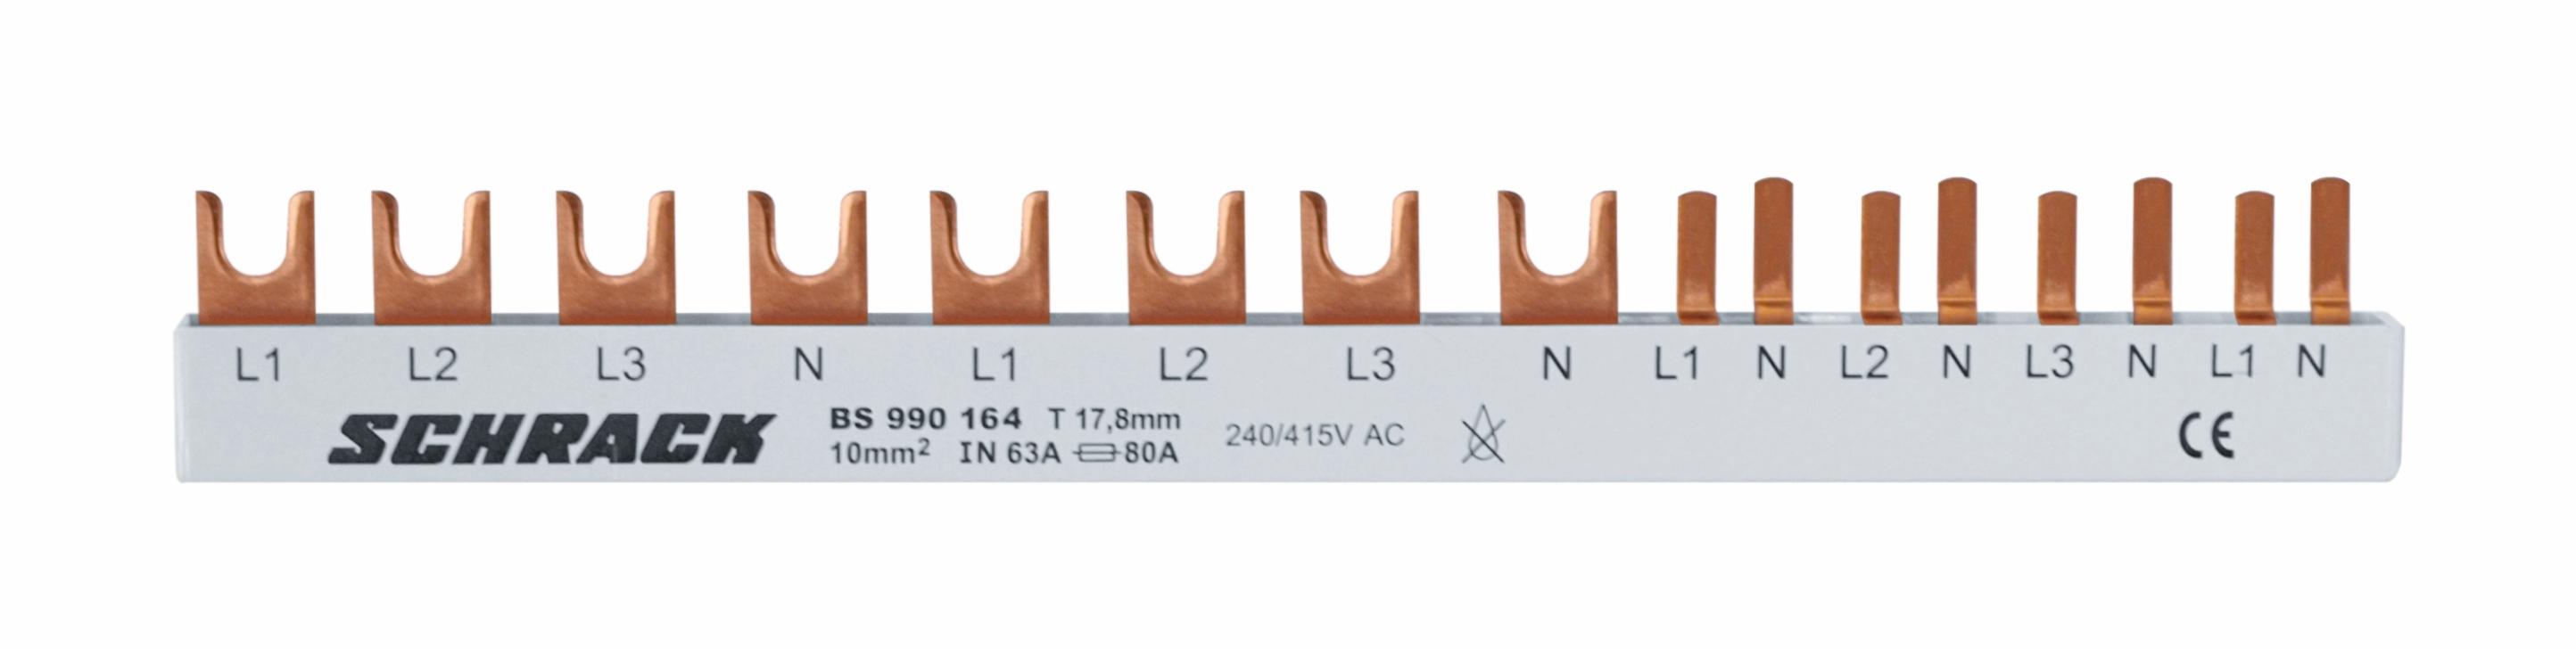 1 Stk Versch.schmal 4-pol. 1xFI 4-polig,1xSI 4-polig,4xSI 1+N 12TE BS990164--